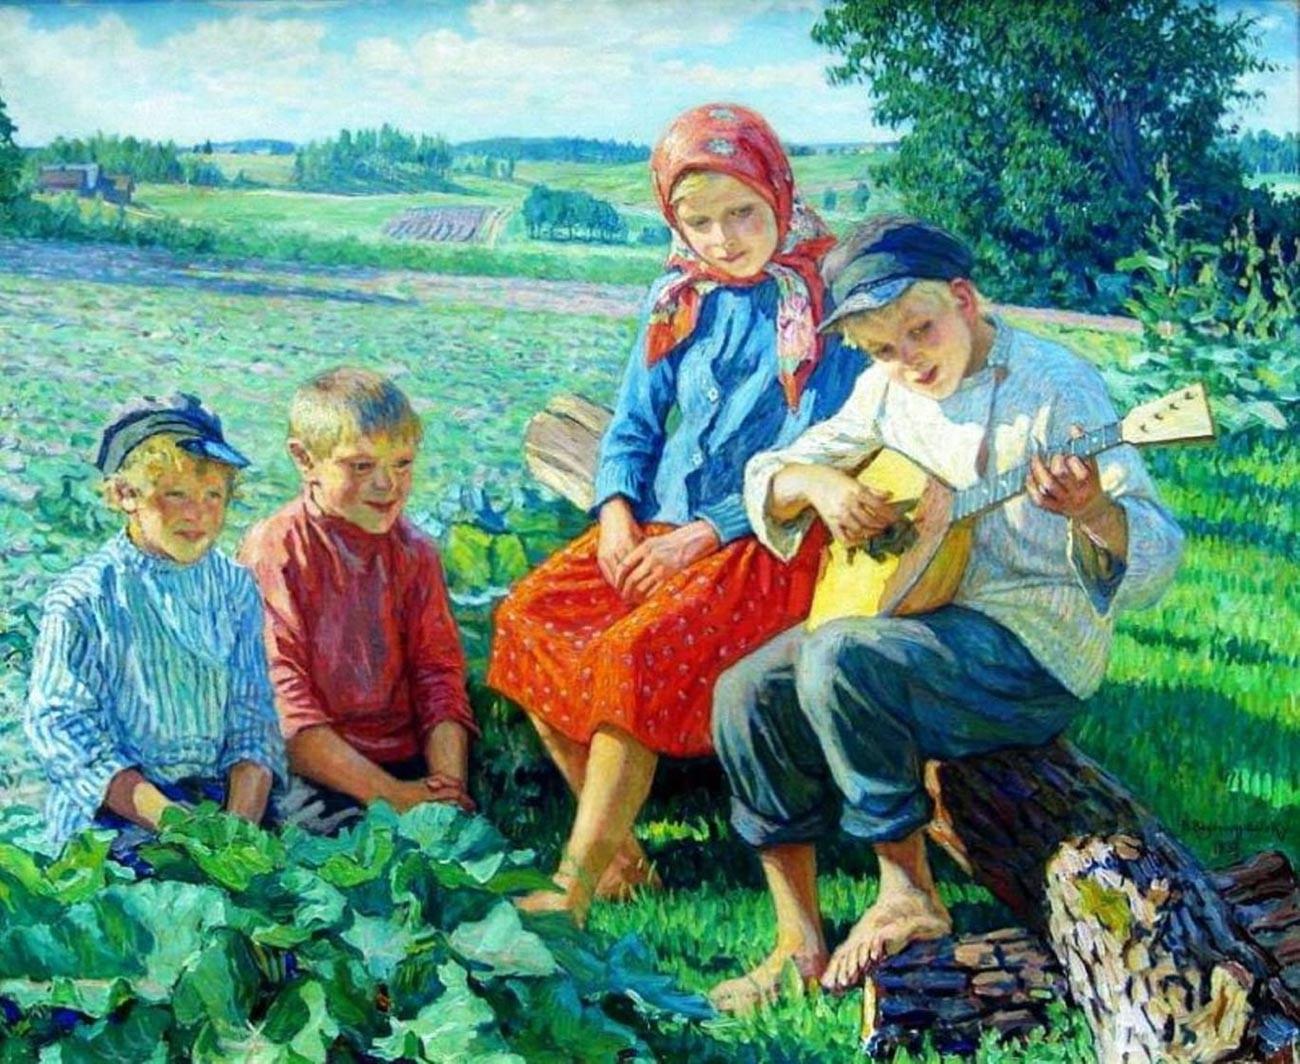 """Anak-anak bermain balalaika"", 1937, oleh Nikolai Bogdanov-Belsky (1868—1945)."